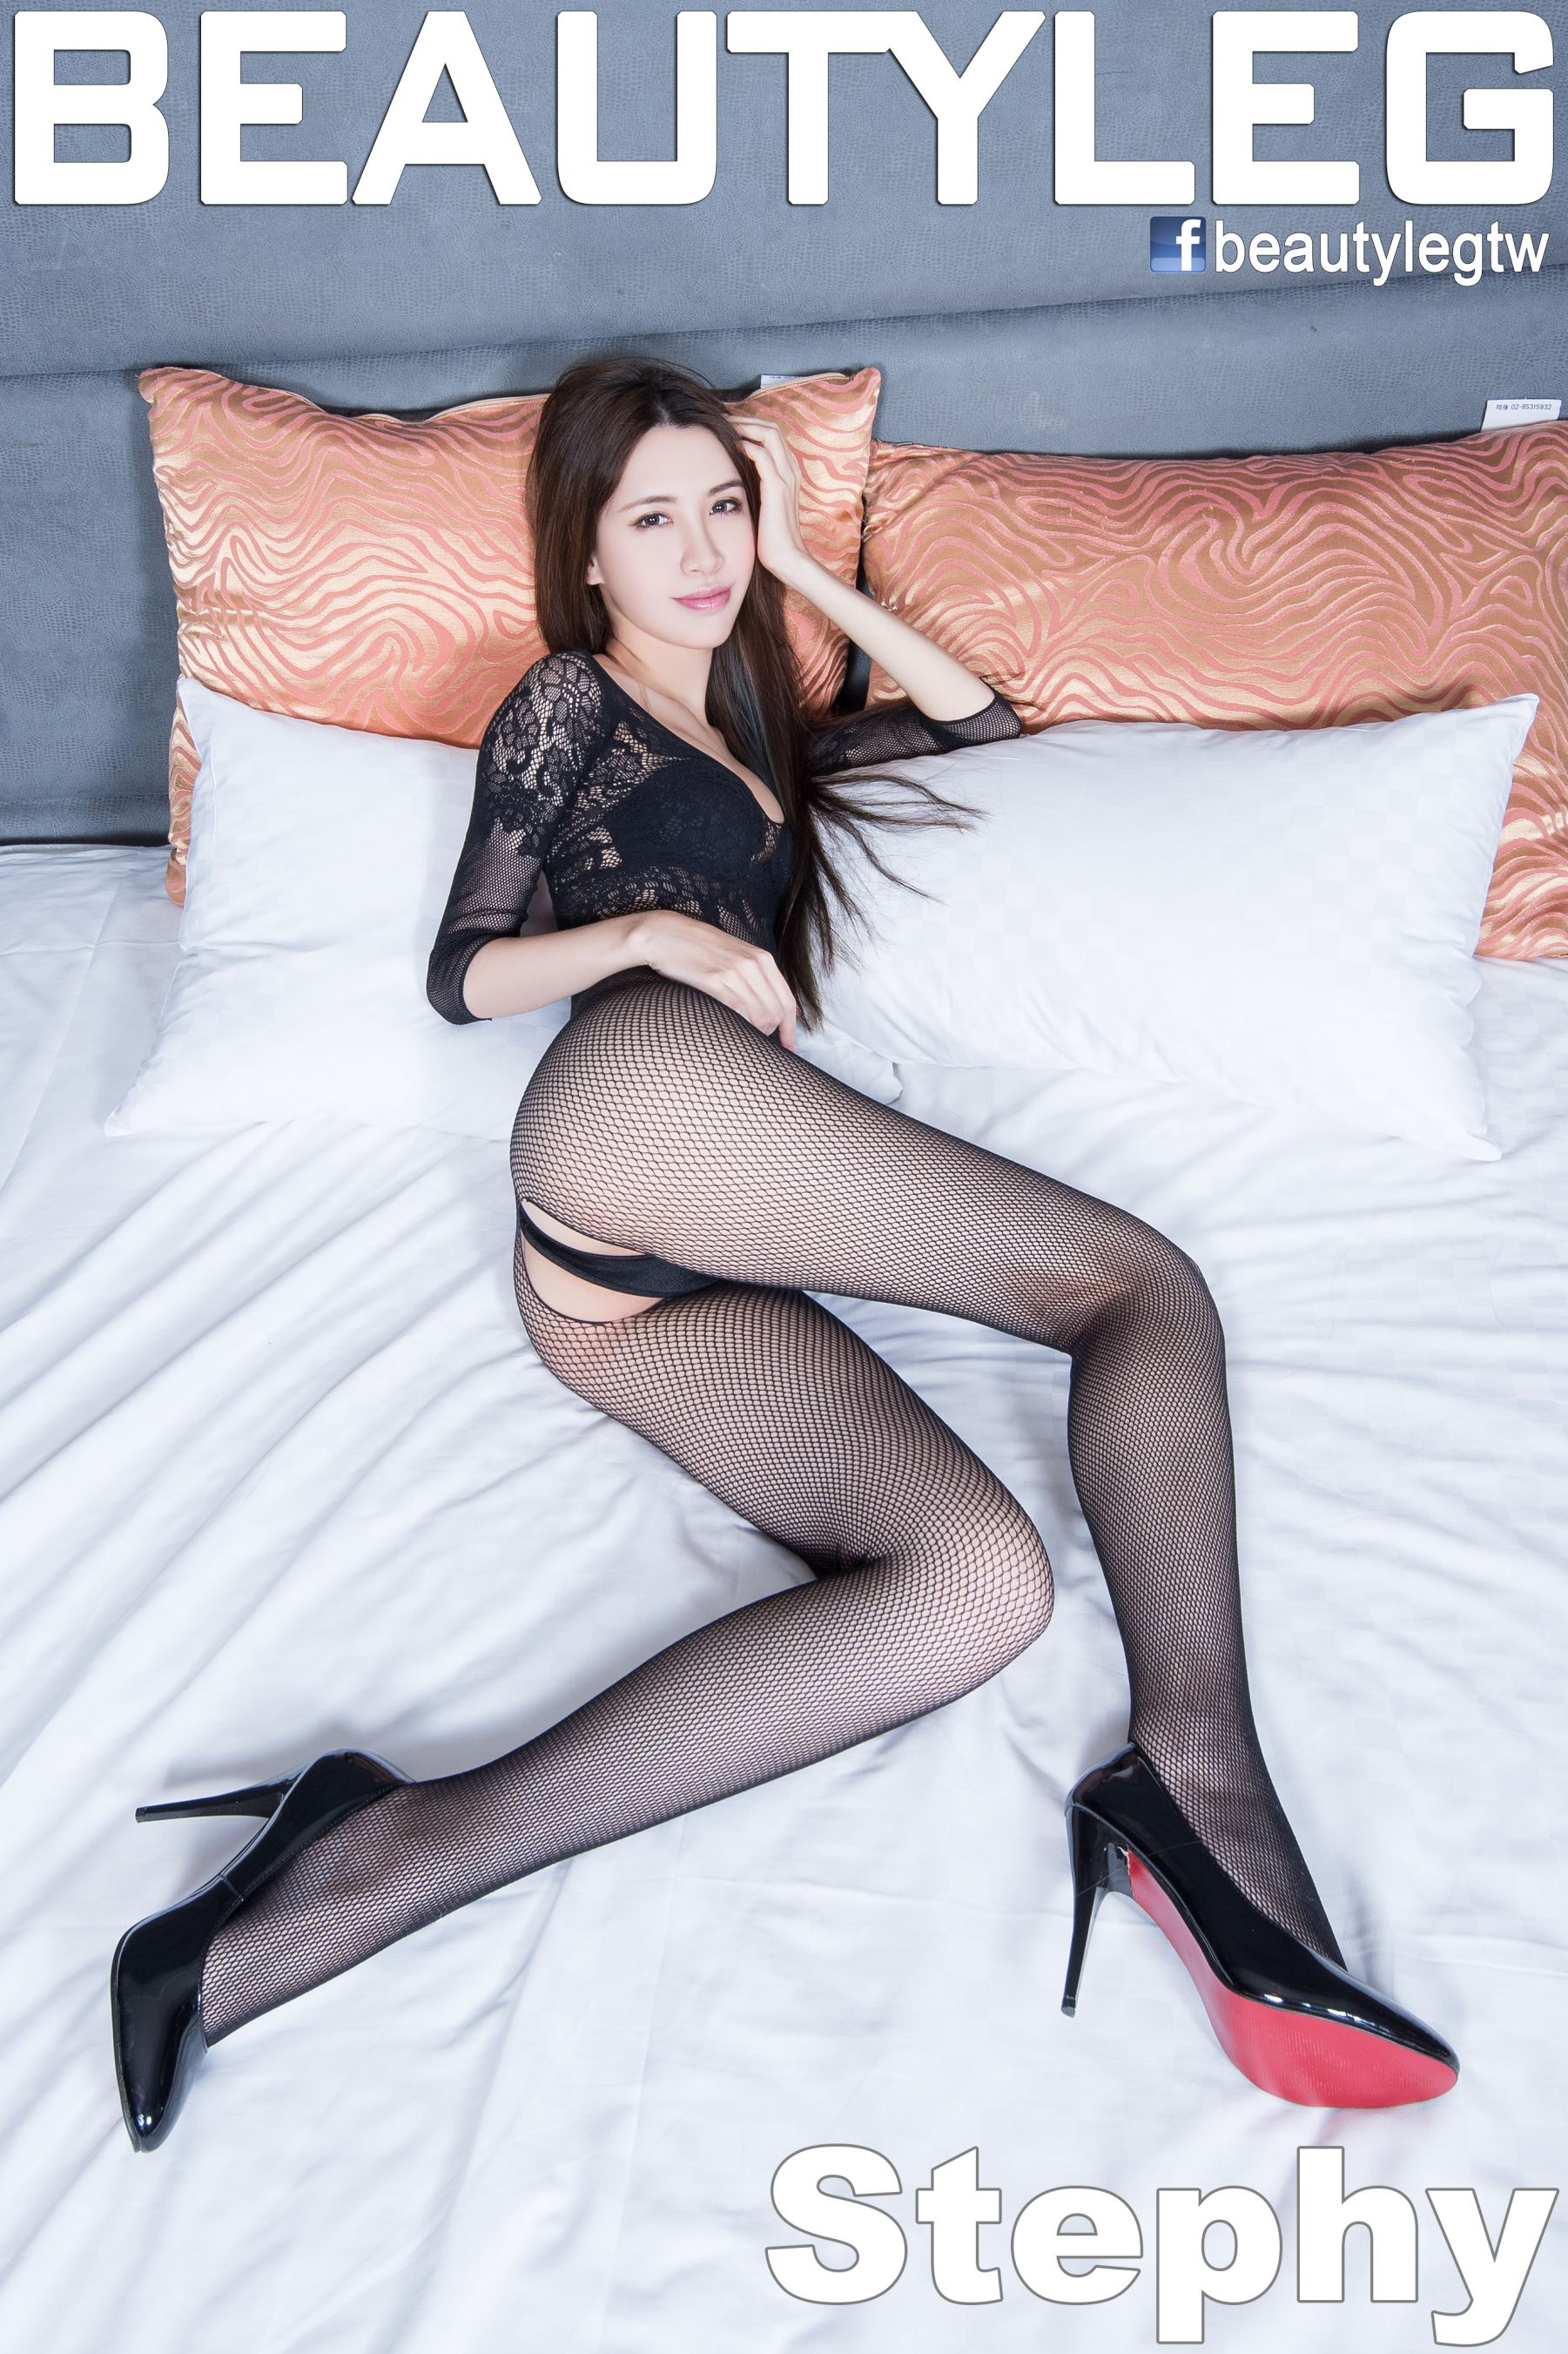 VOL.342 [Beautyleg]美腿情趣丝袜:崔多朵(崔德蓉,腿模Stephy)高品质写真套图(68P)